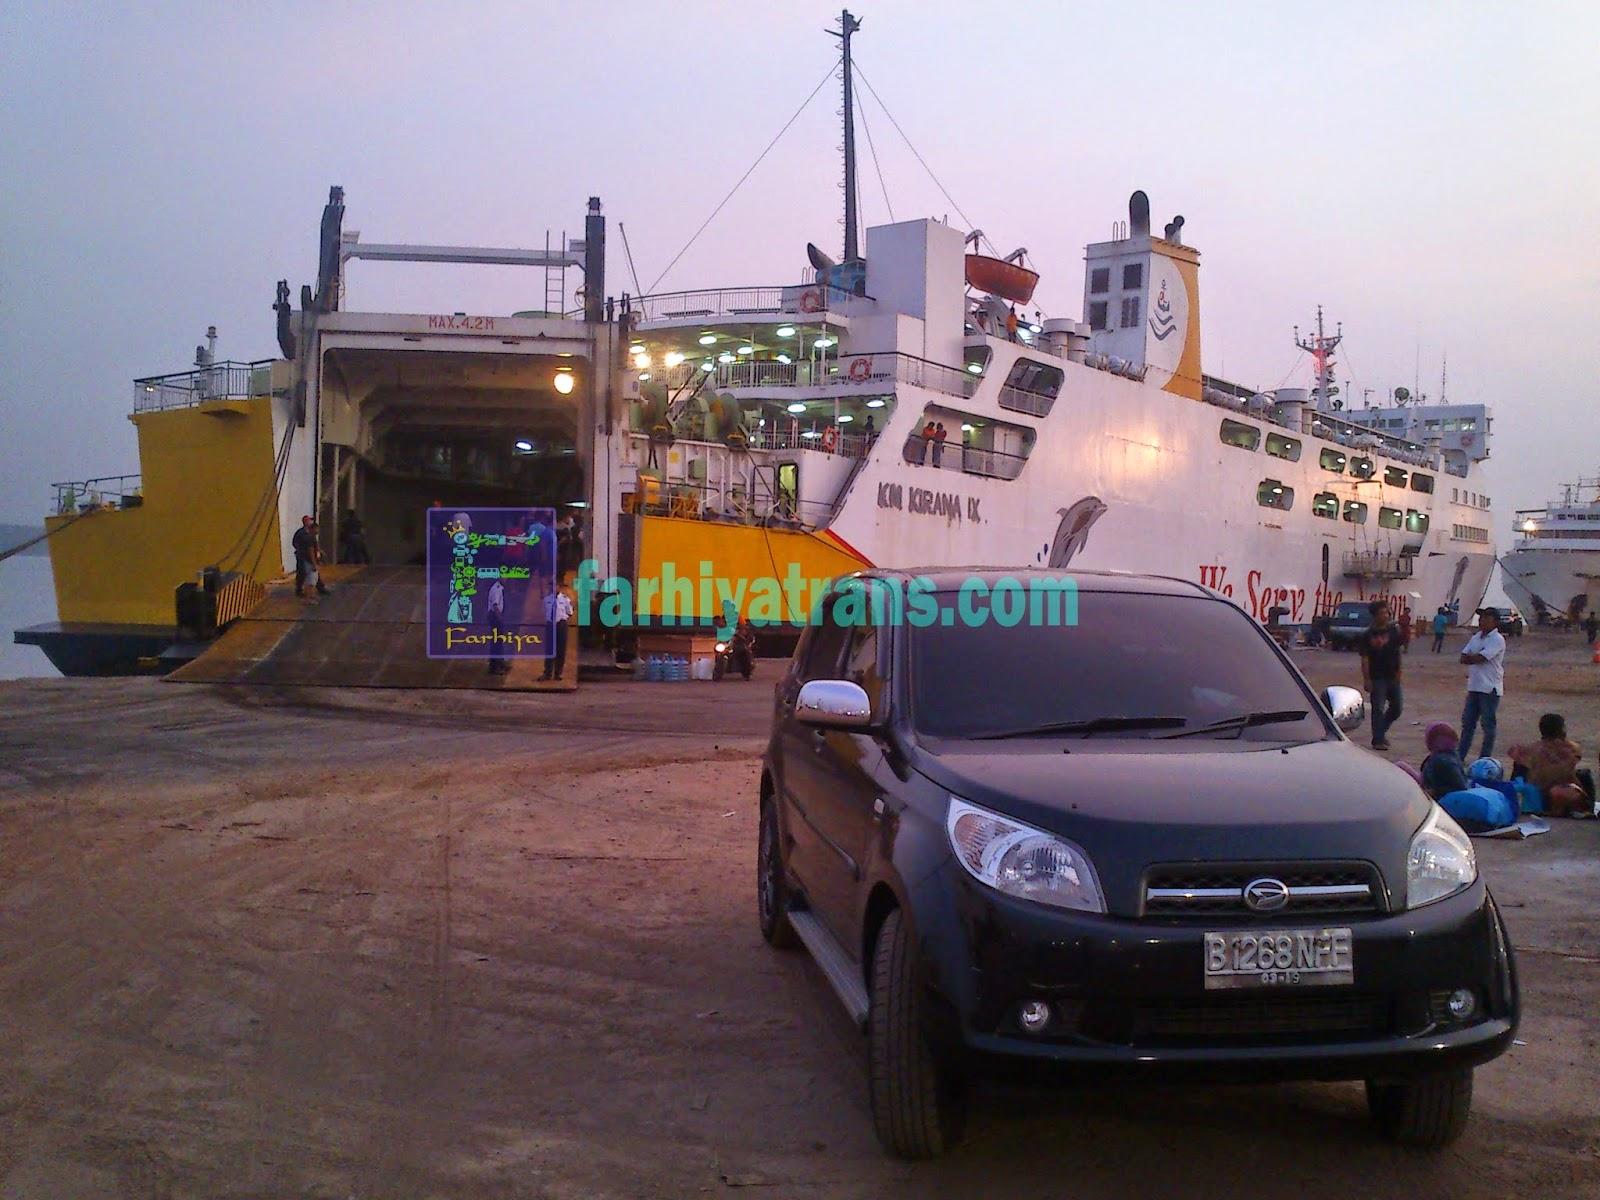 Pengiriman Mobil tujuan Surabaya-Batulicin dengan Kapal Kirana IX